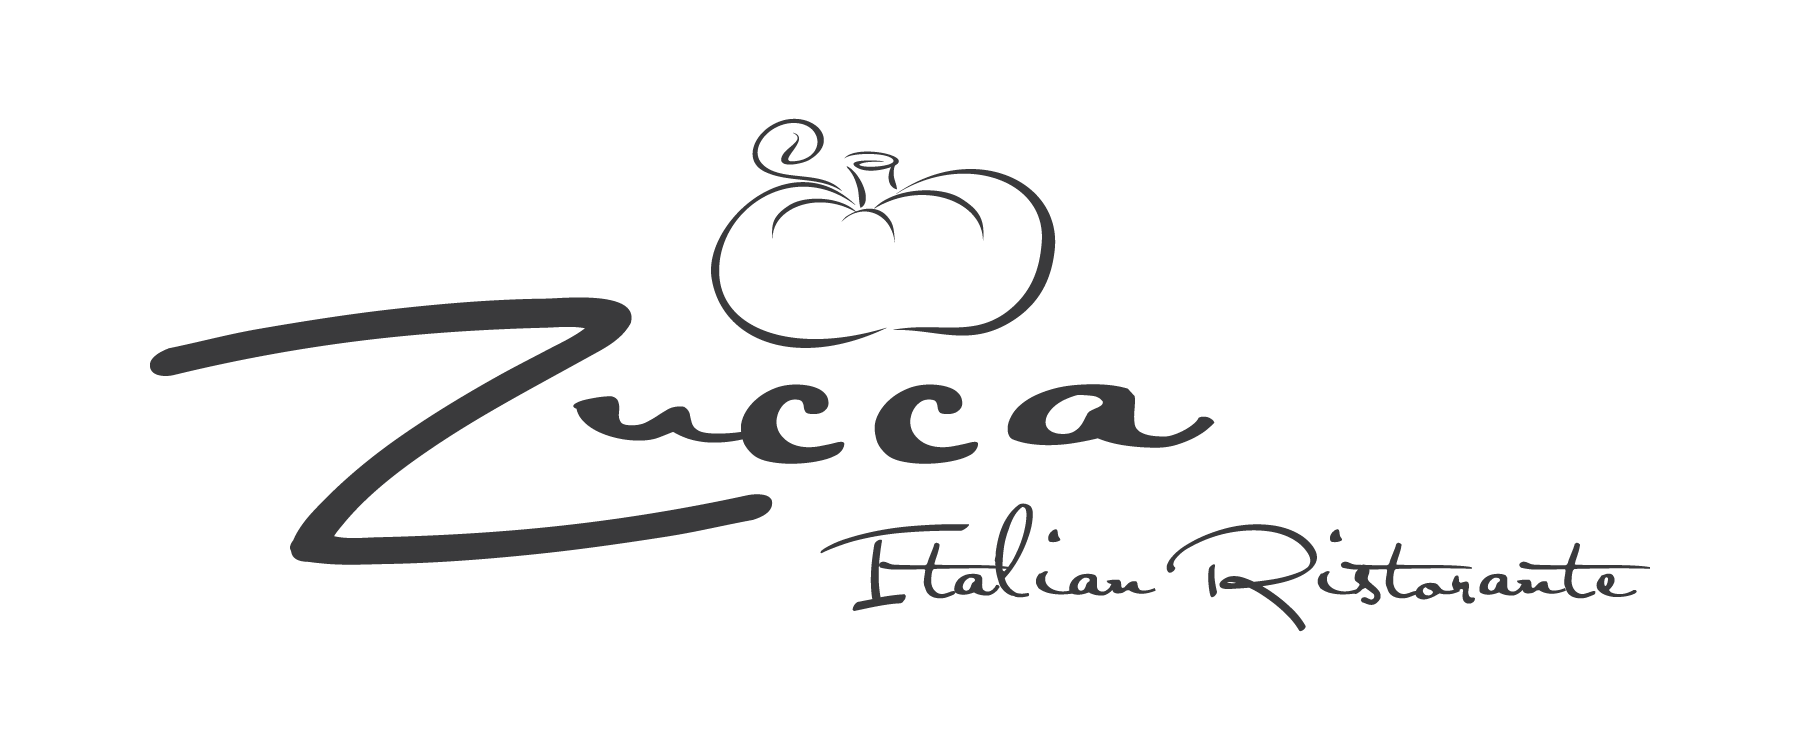 zucca_logos_1-01.png